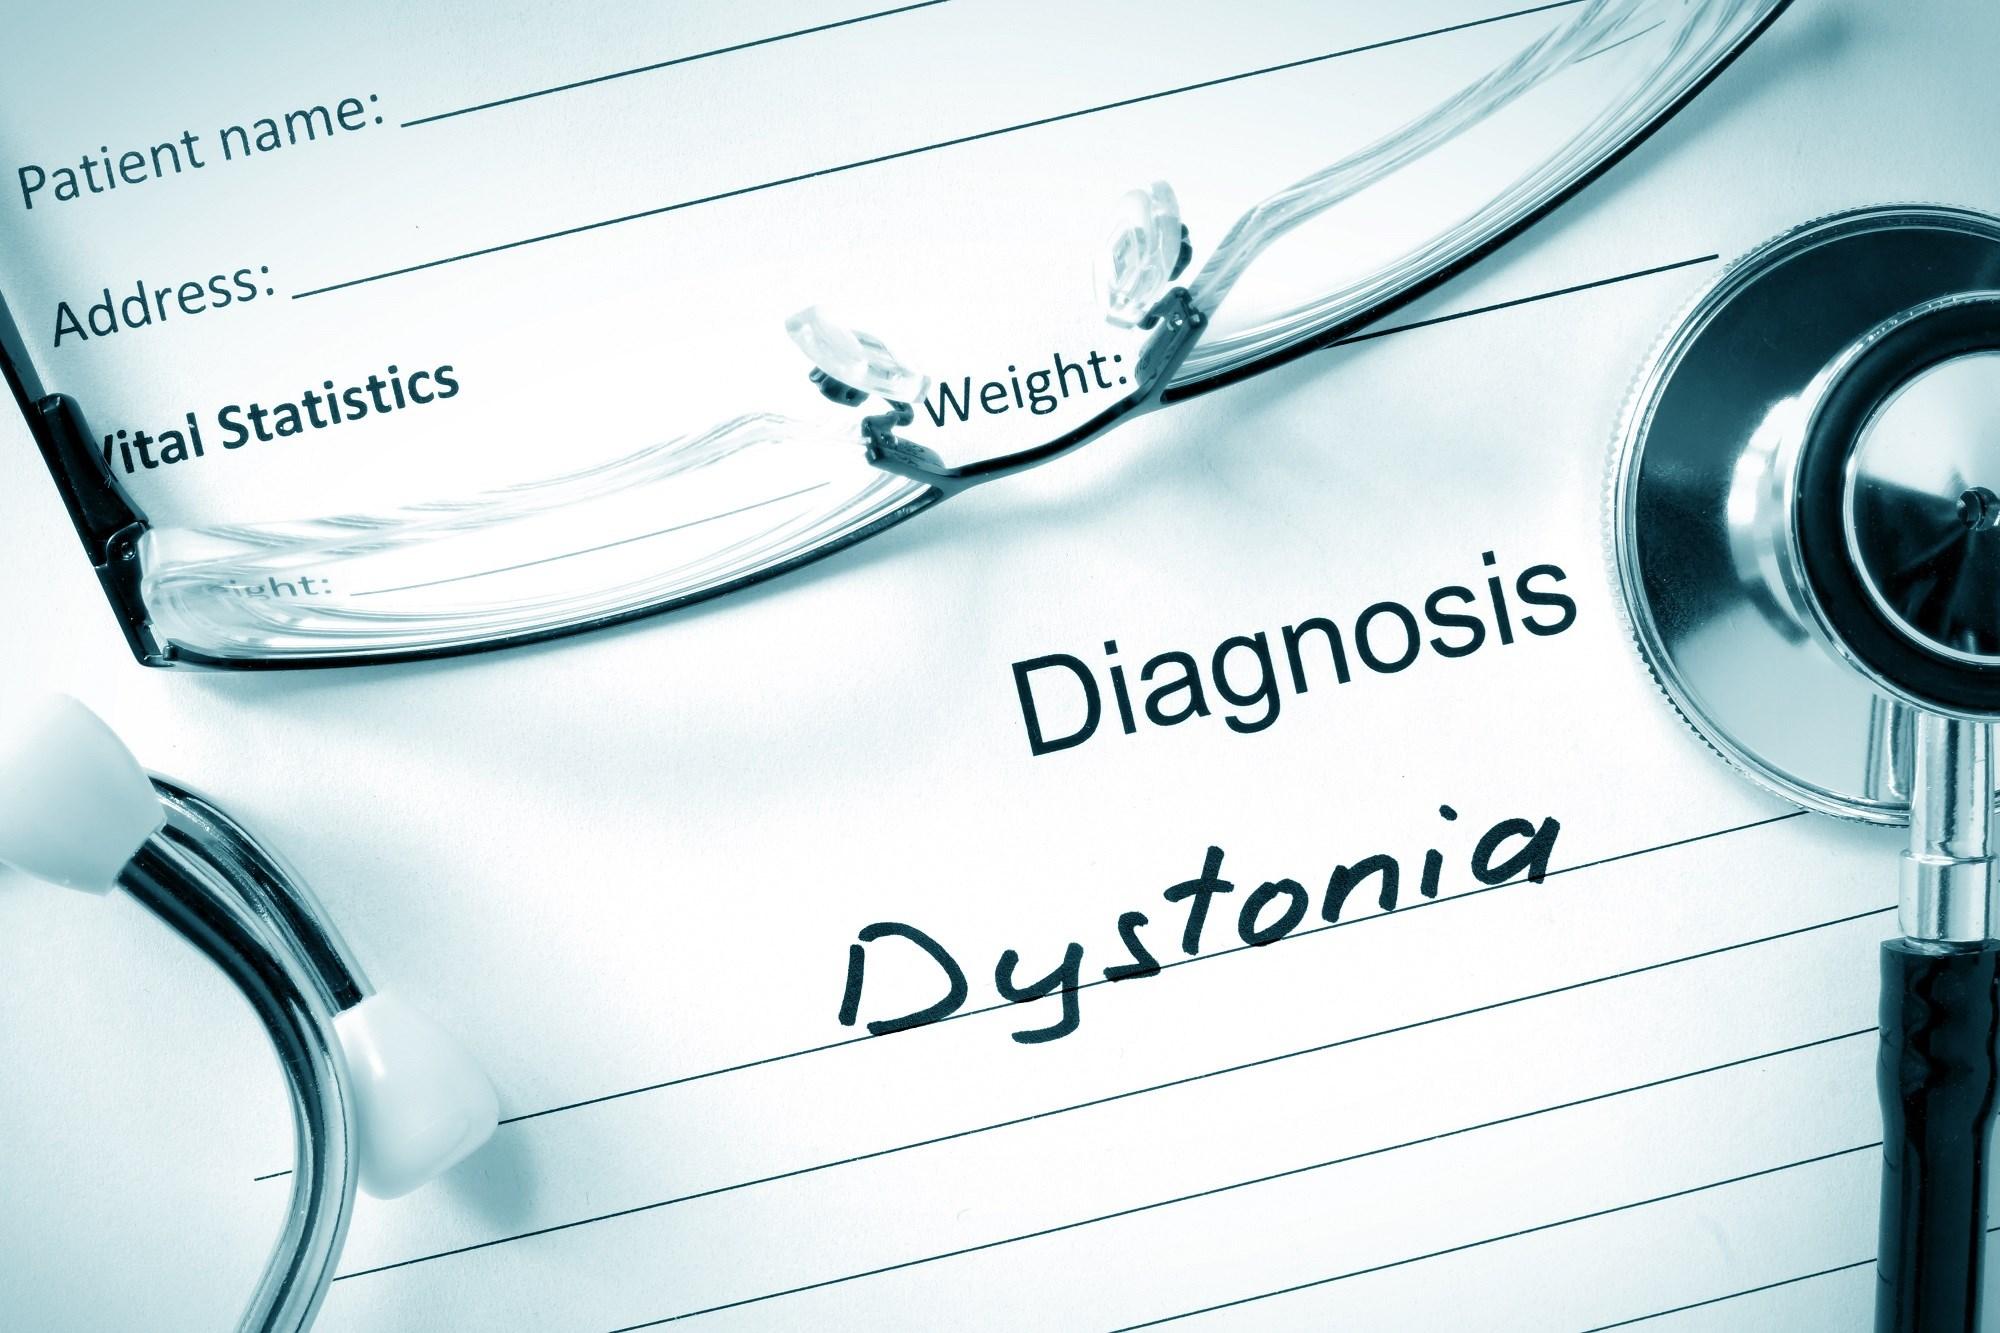 Bilateral Pallidal Deep Brain Stimulation Controls Dystonia in X-Linked Dystonia-Parkinsonism